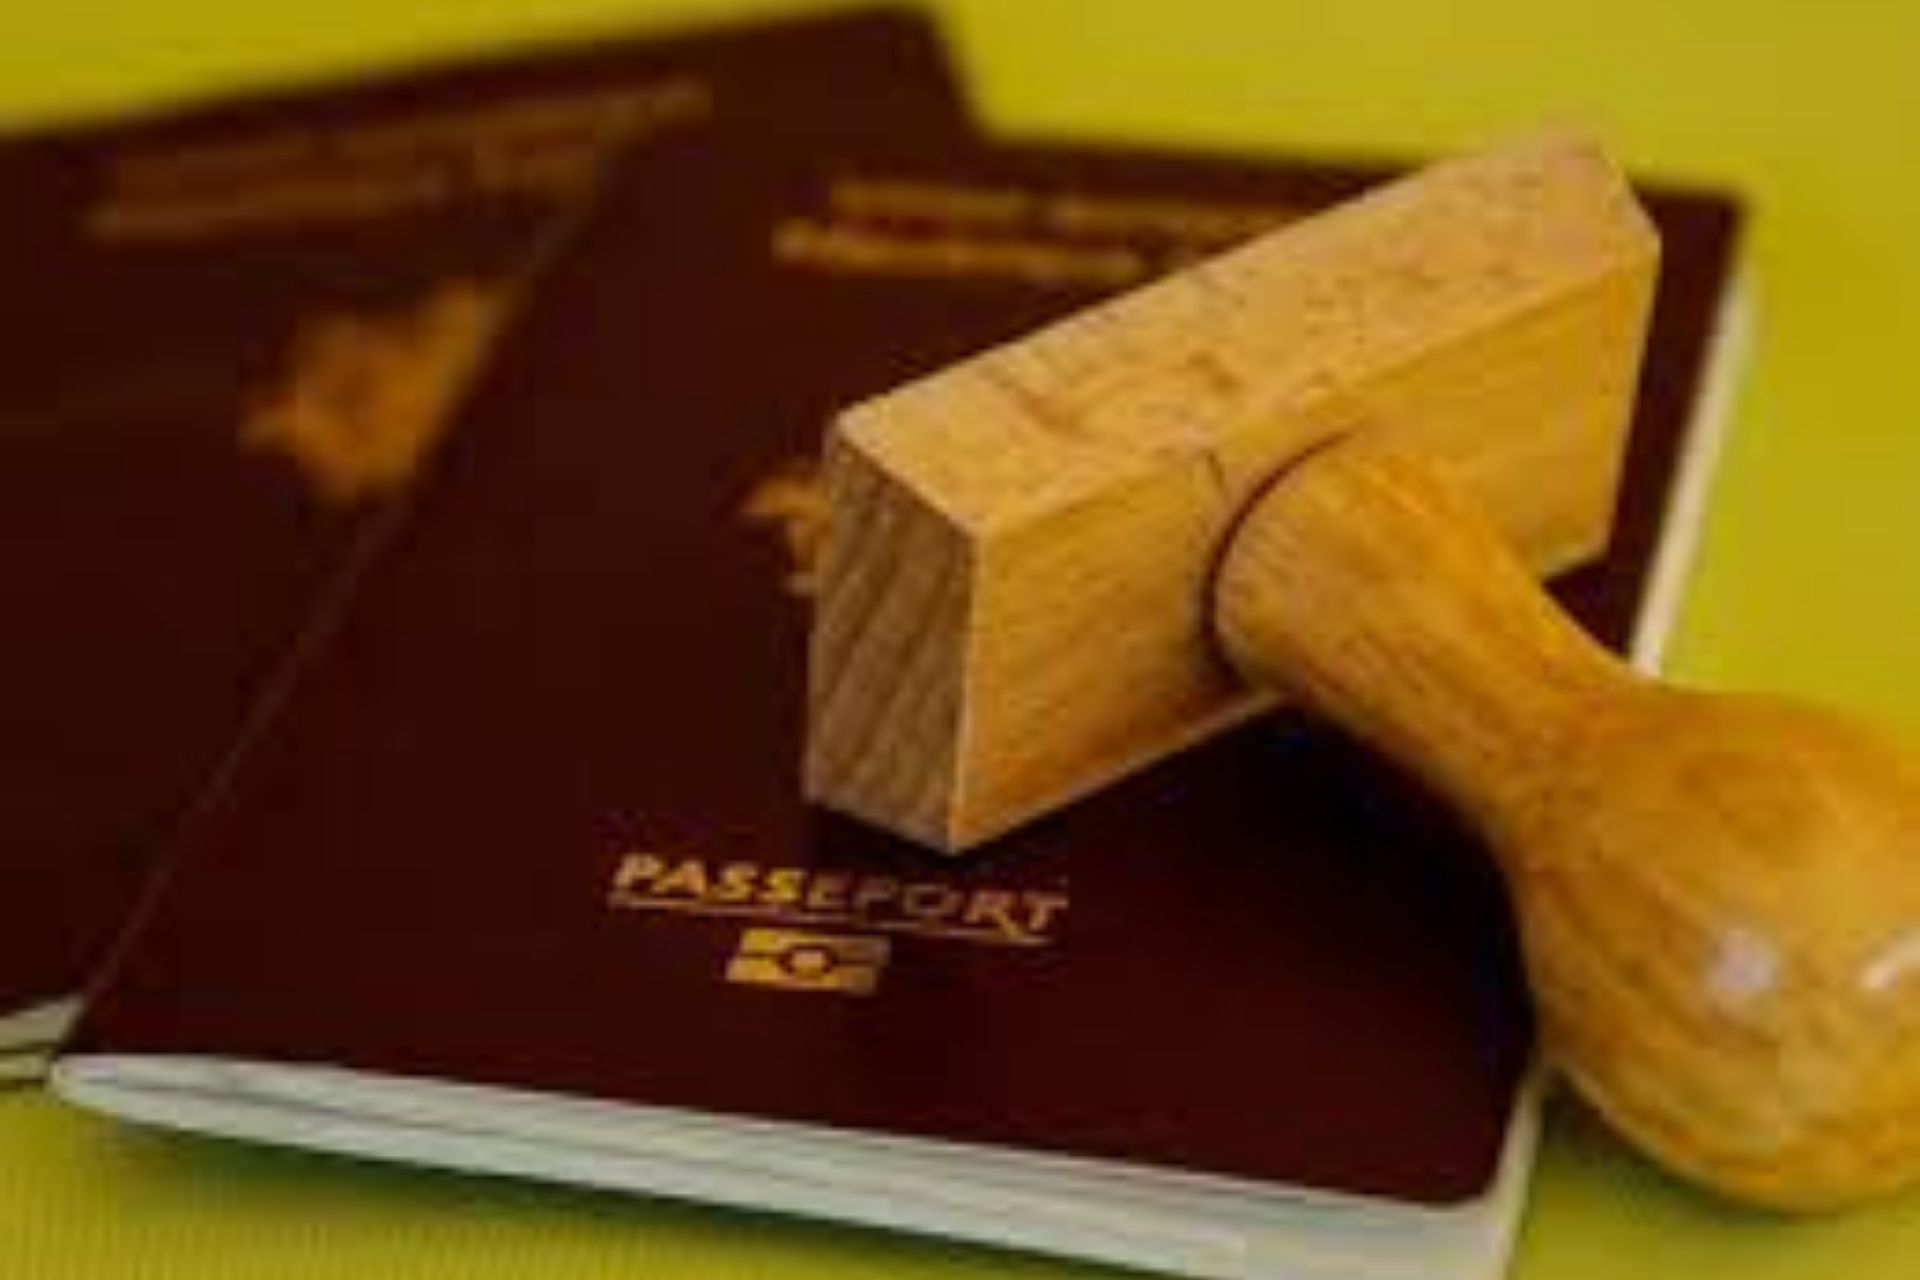 passaportes mais poderosos 2021 carimbo